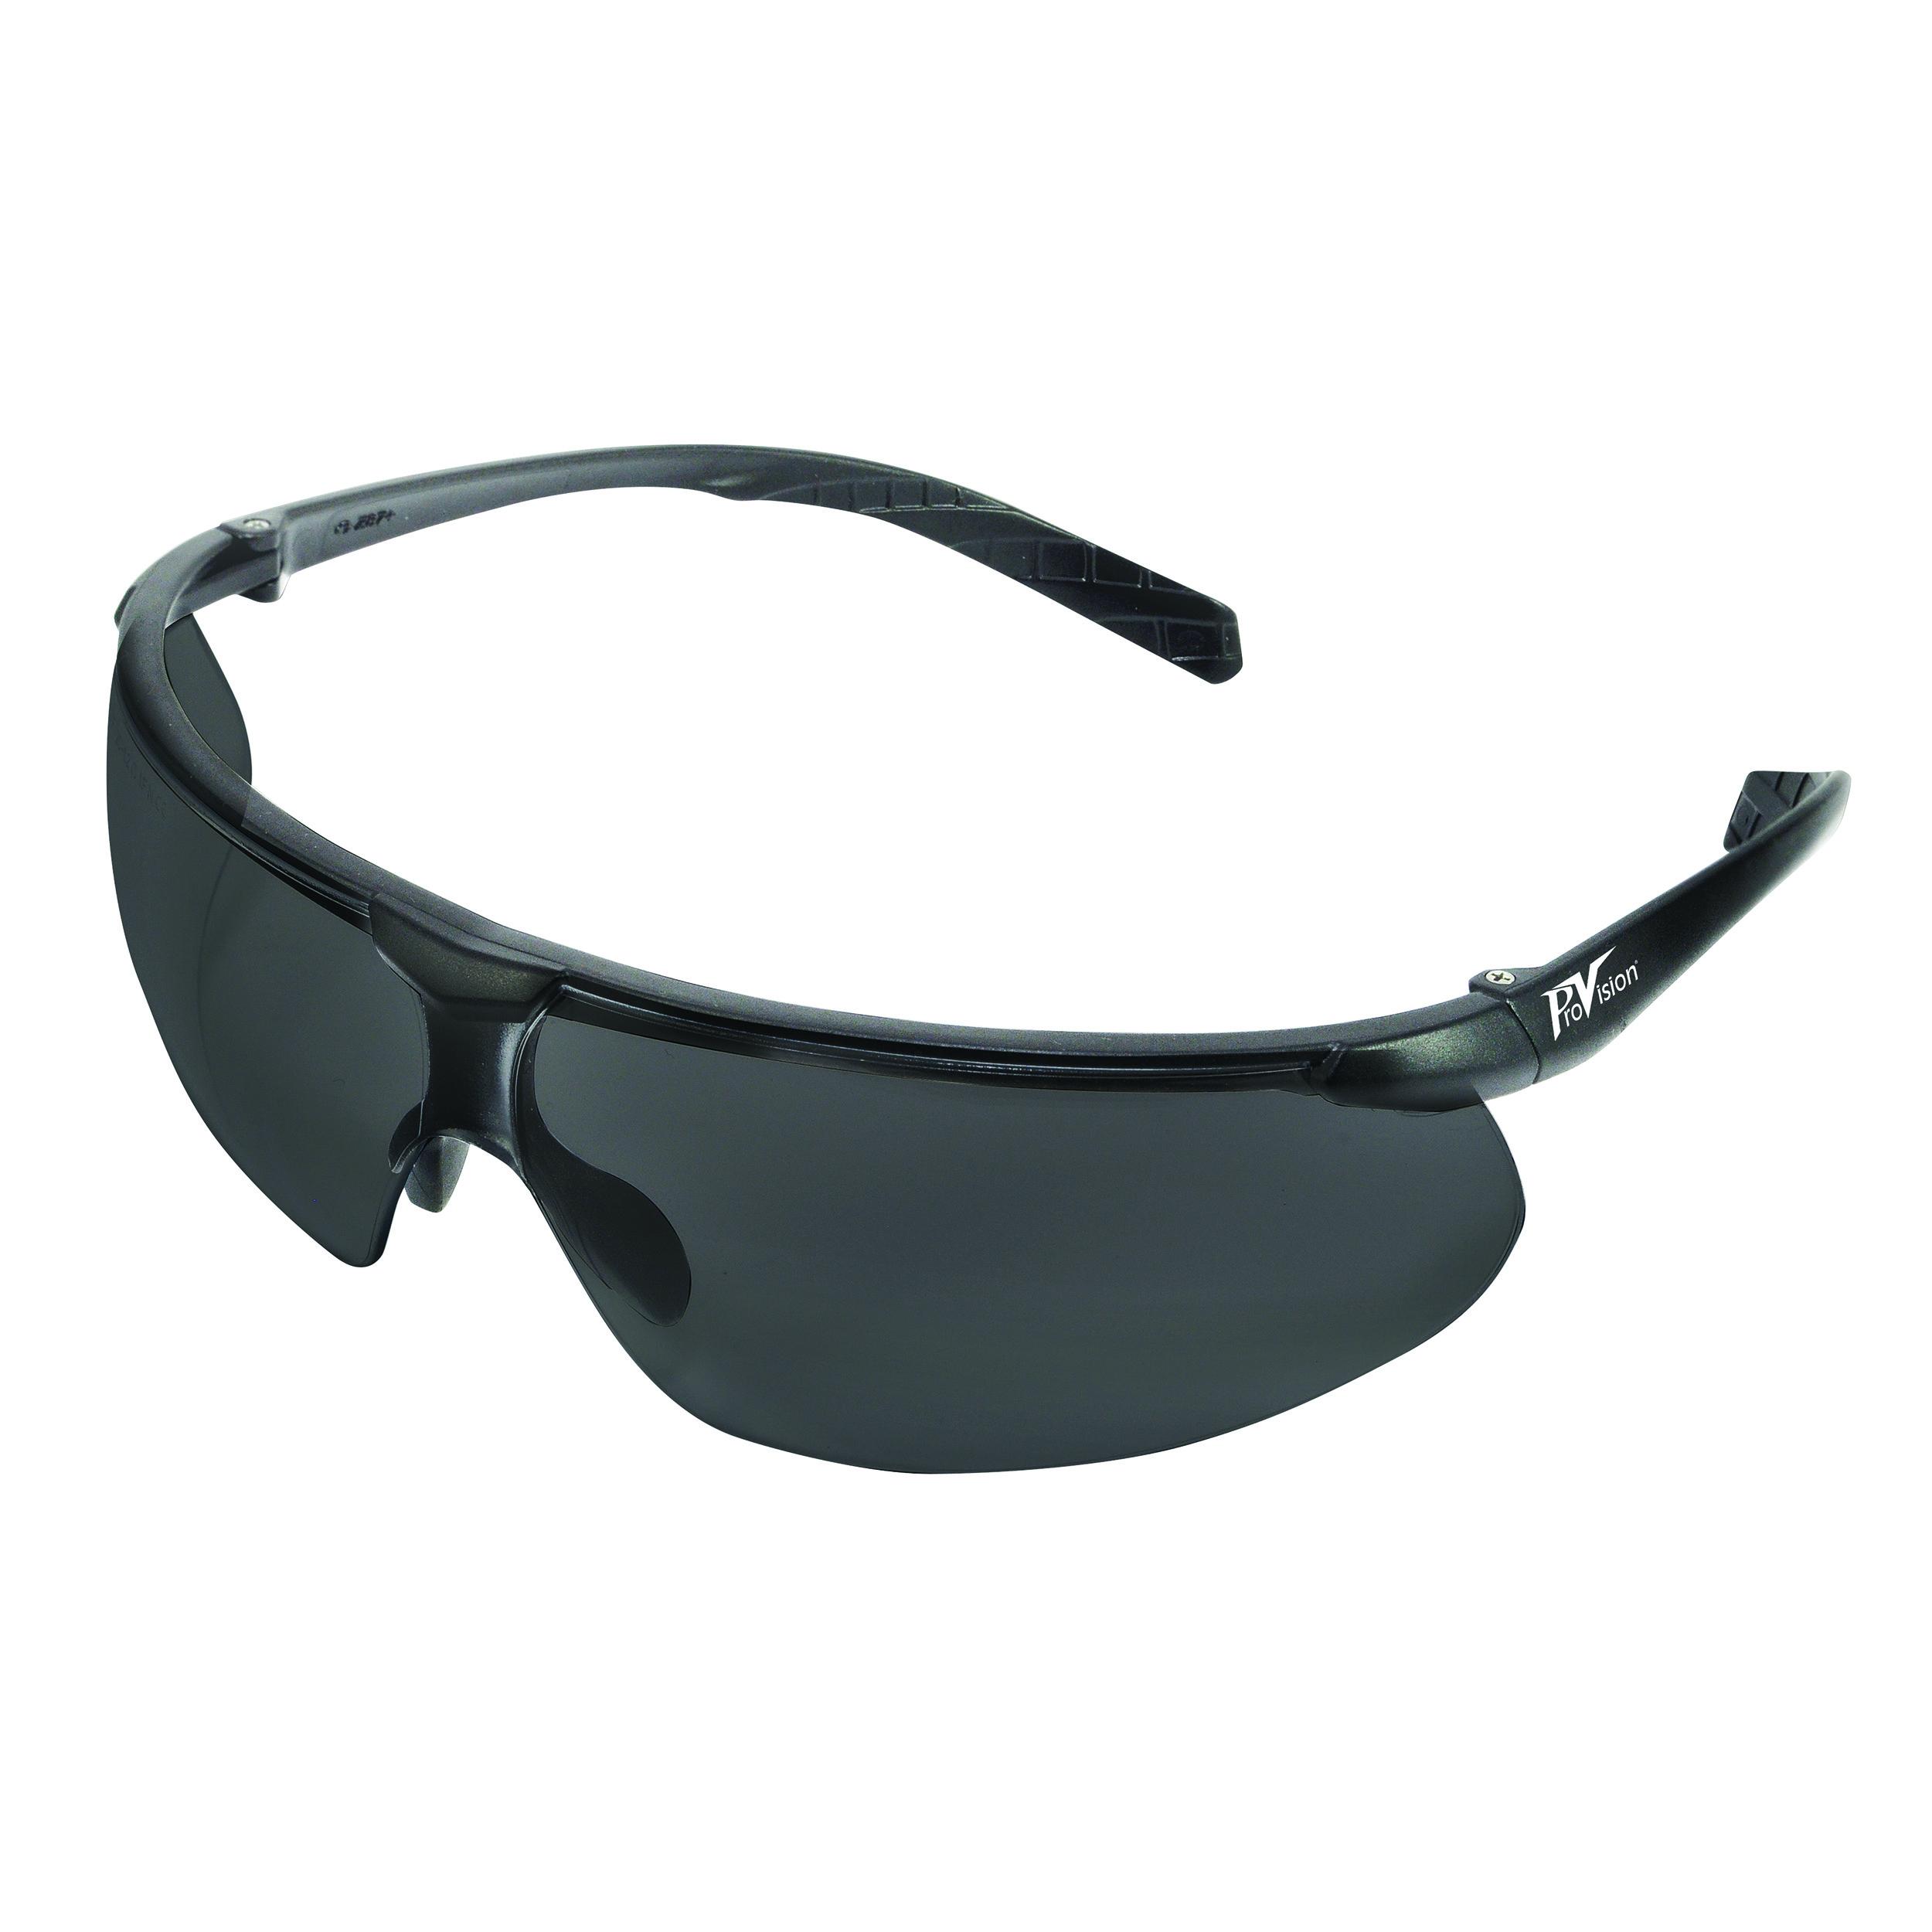 9200120 ProVision Element  Eyewear Grey Frame, Grey Lens, 3606G